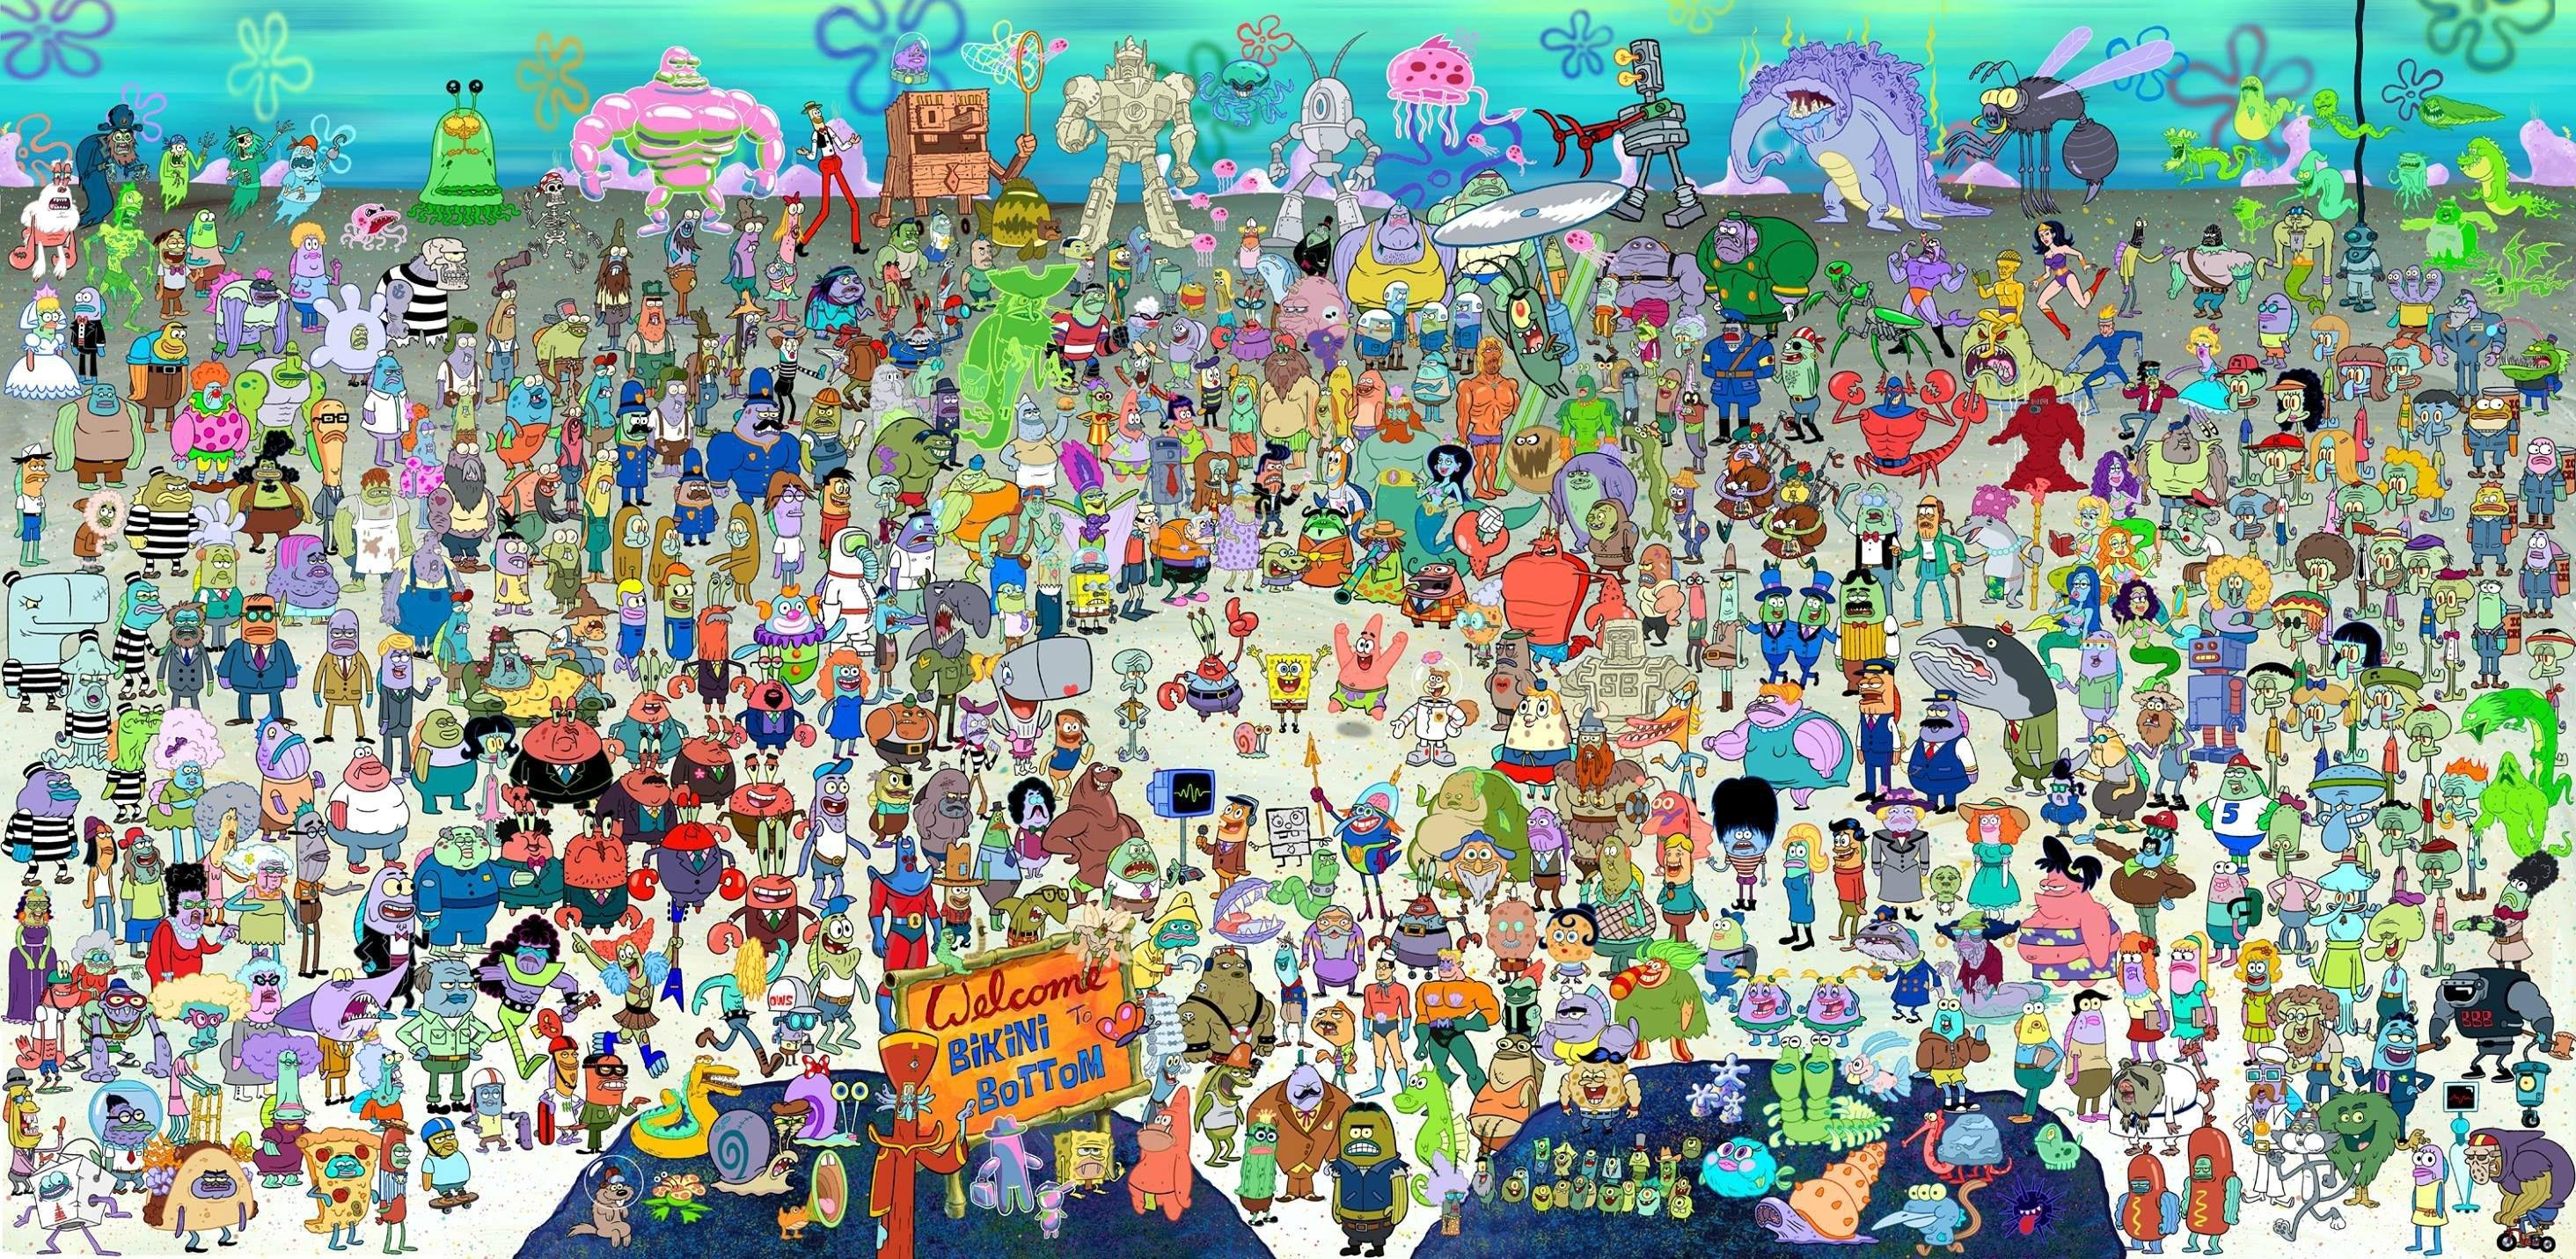 Background In High Quality – spongebob squarepants